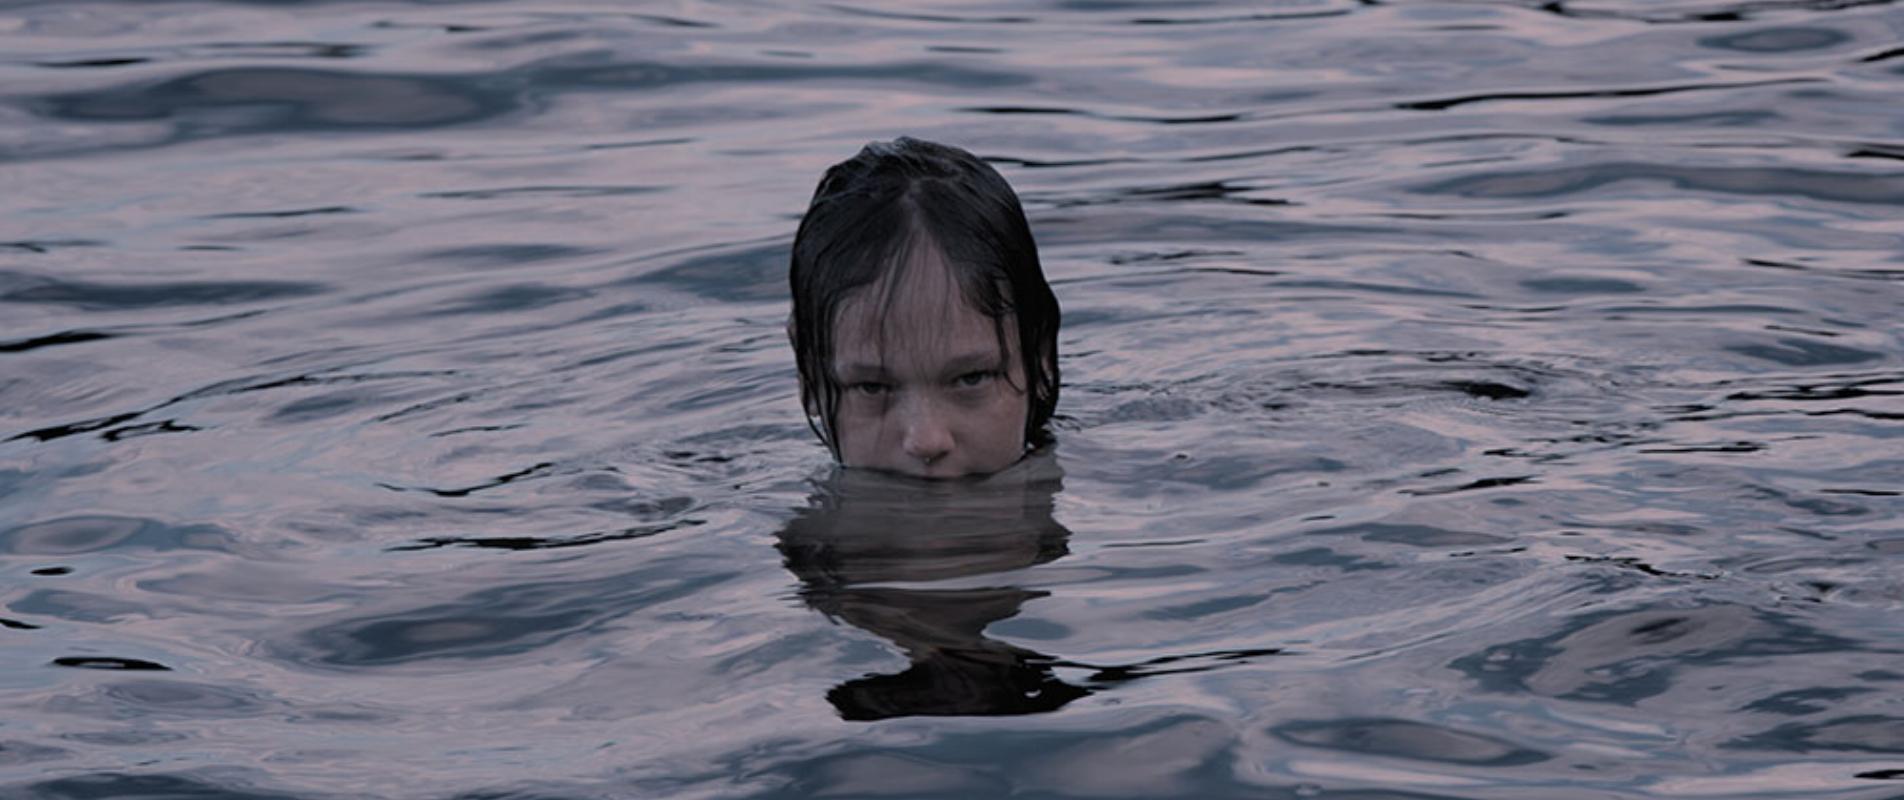 James Newitt - I Go Further Under